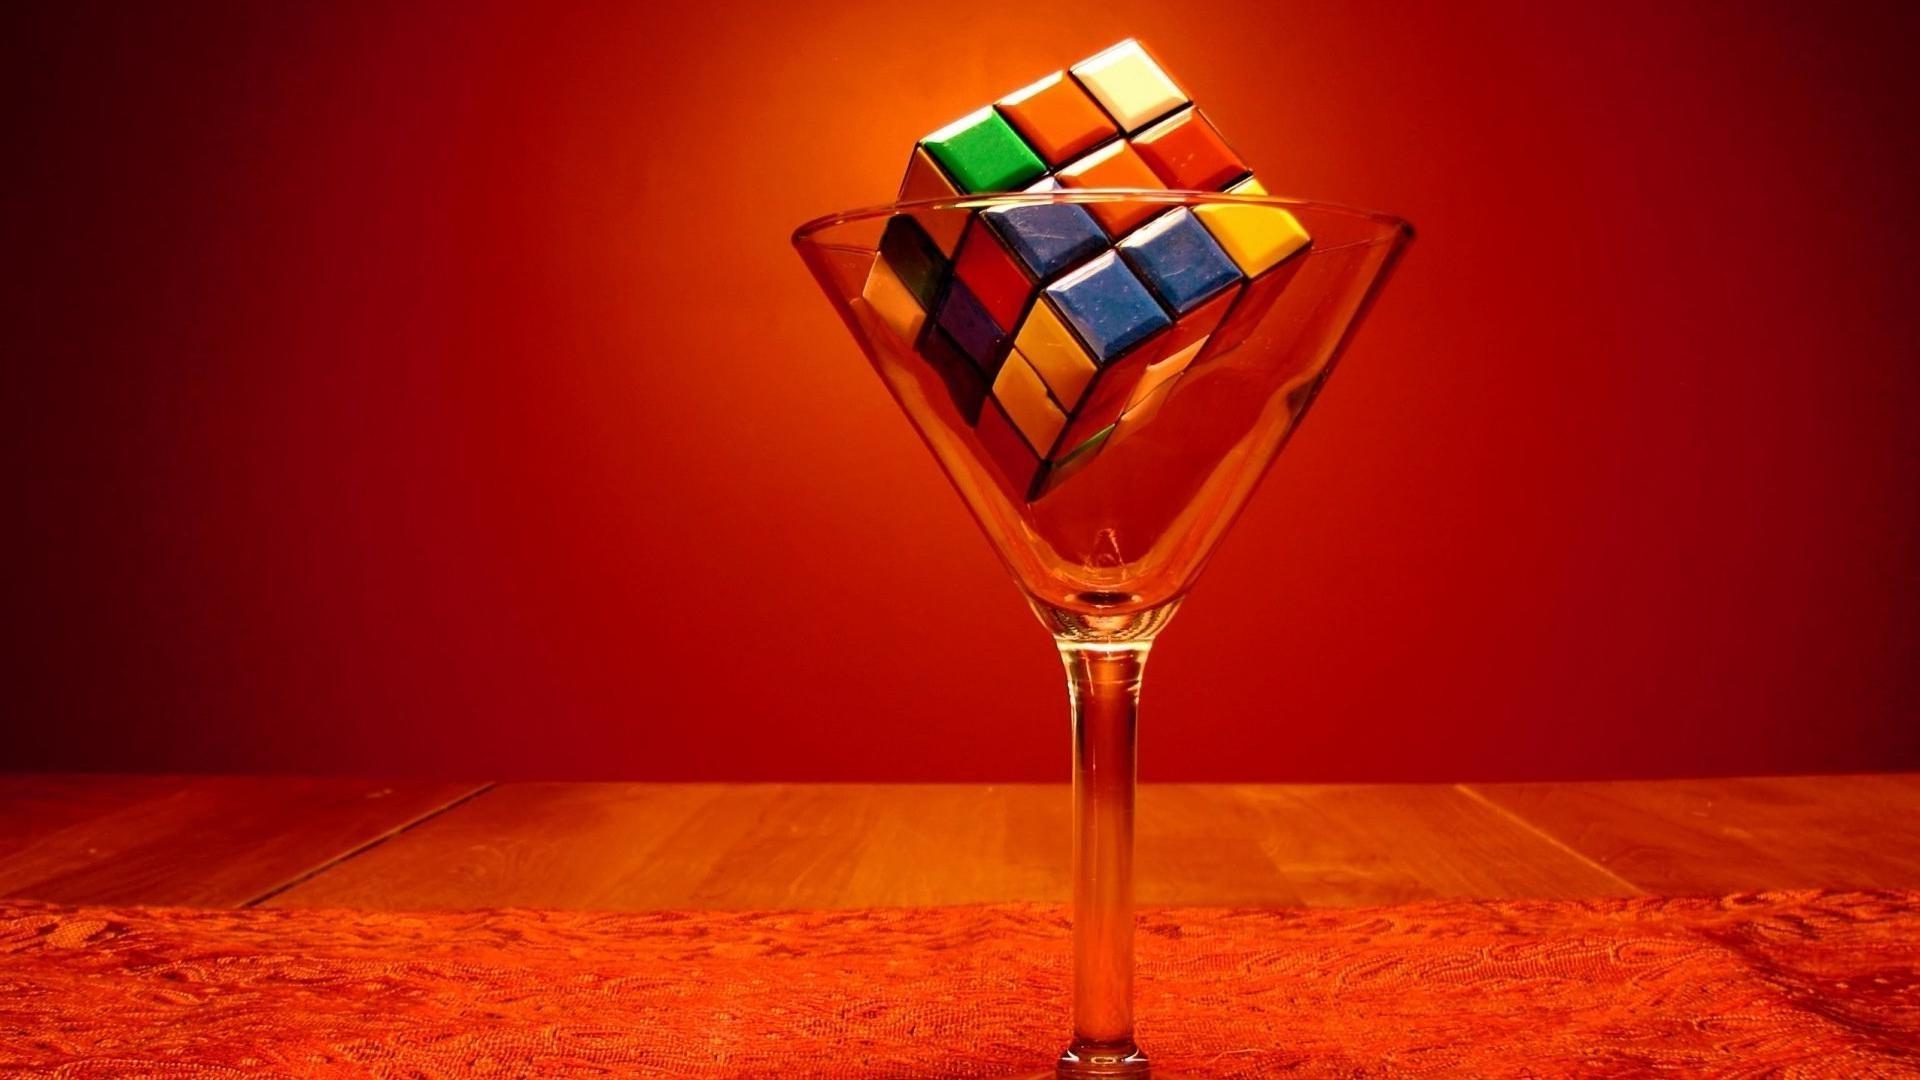 Rubiks cube in martini glass wallpaper   736776 1920x1080